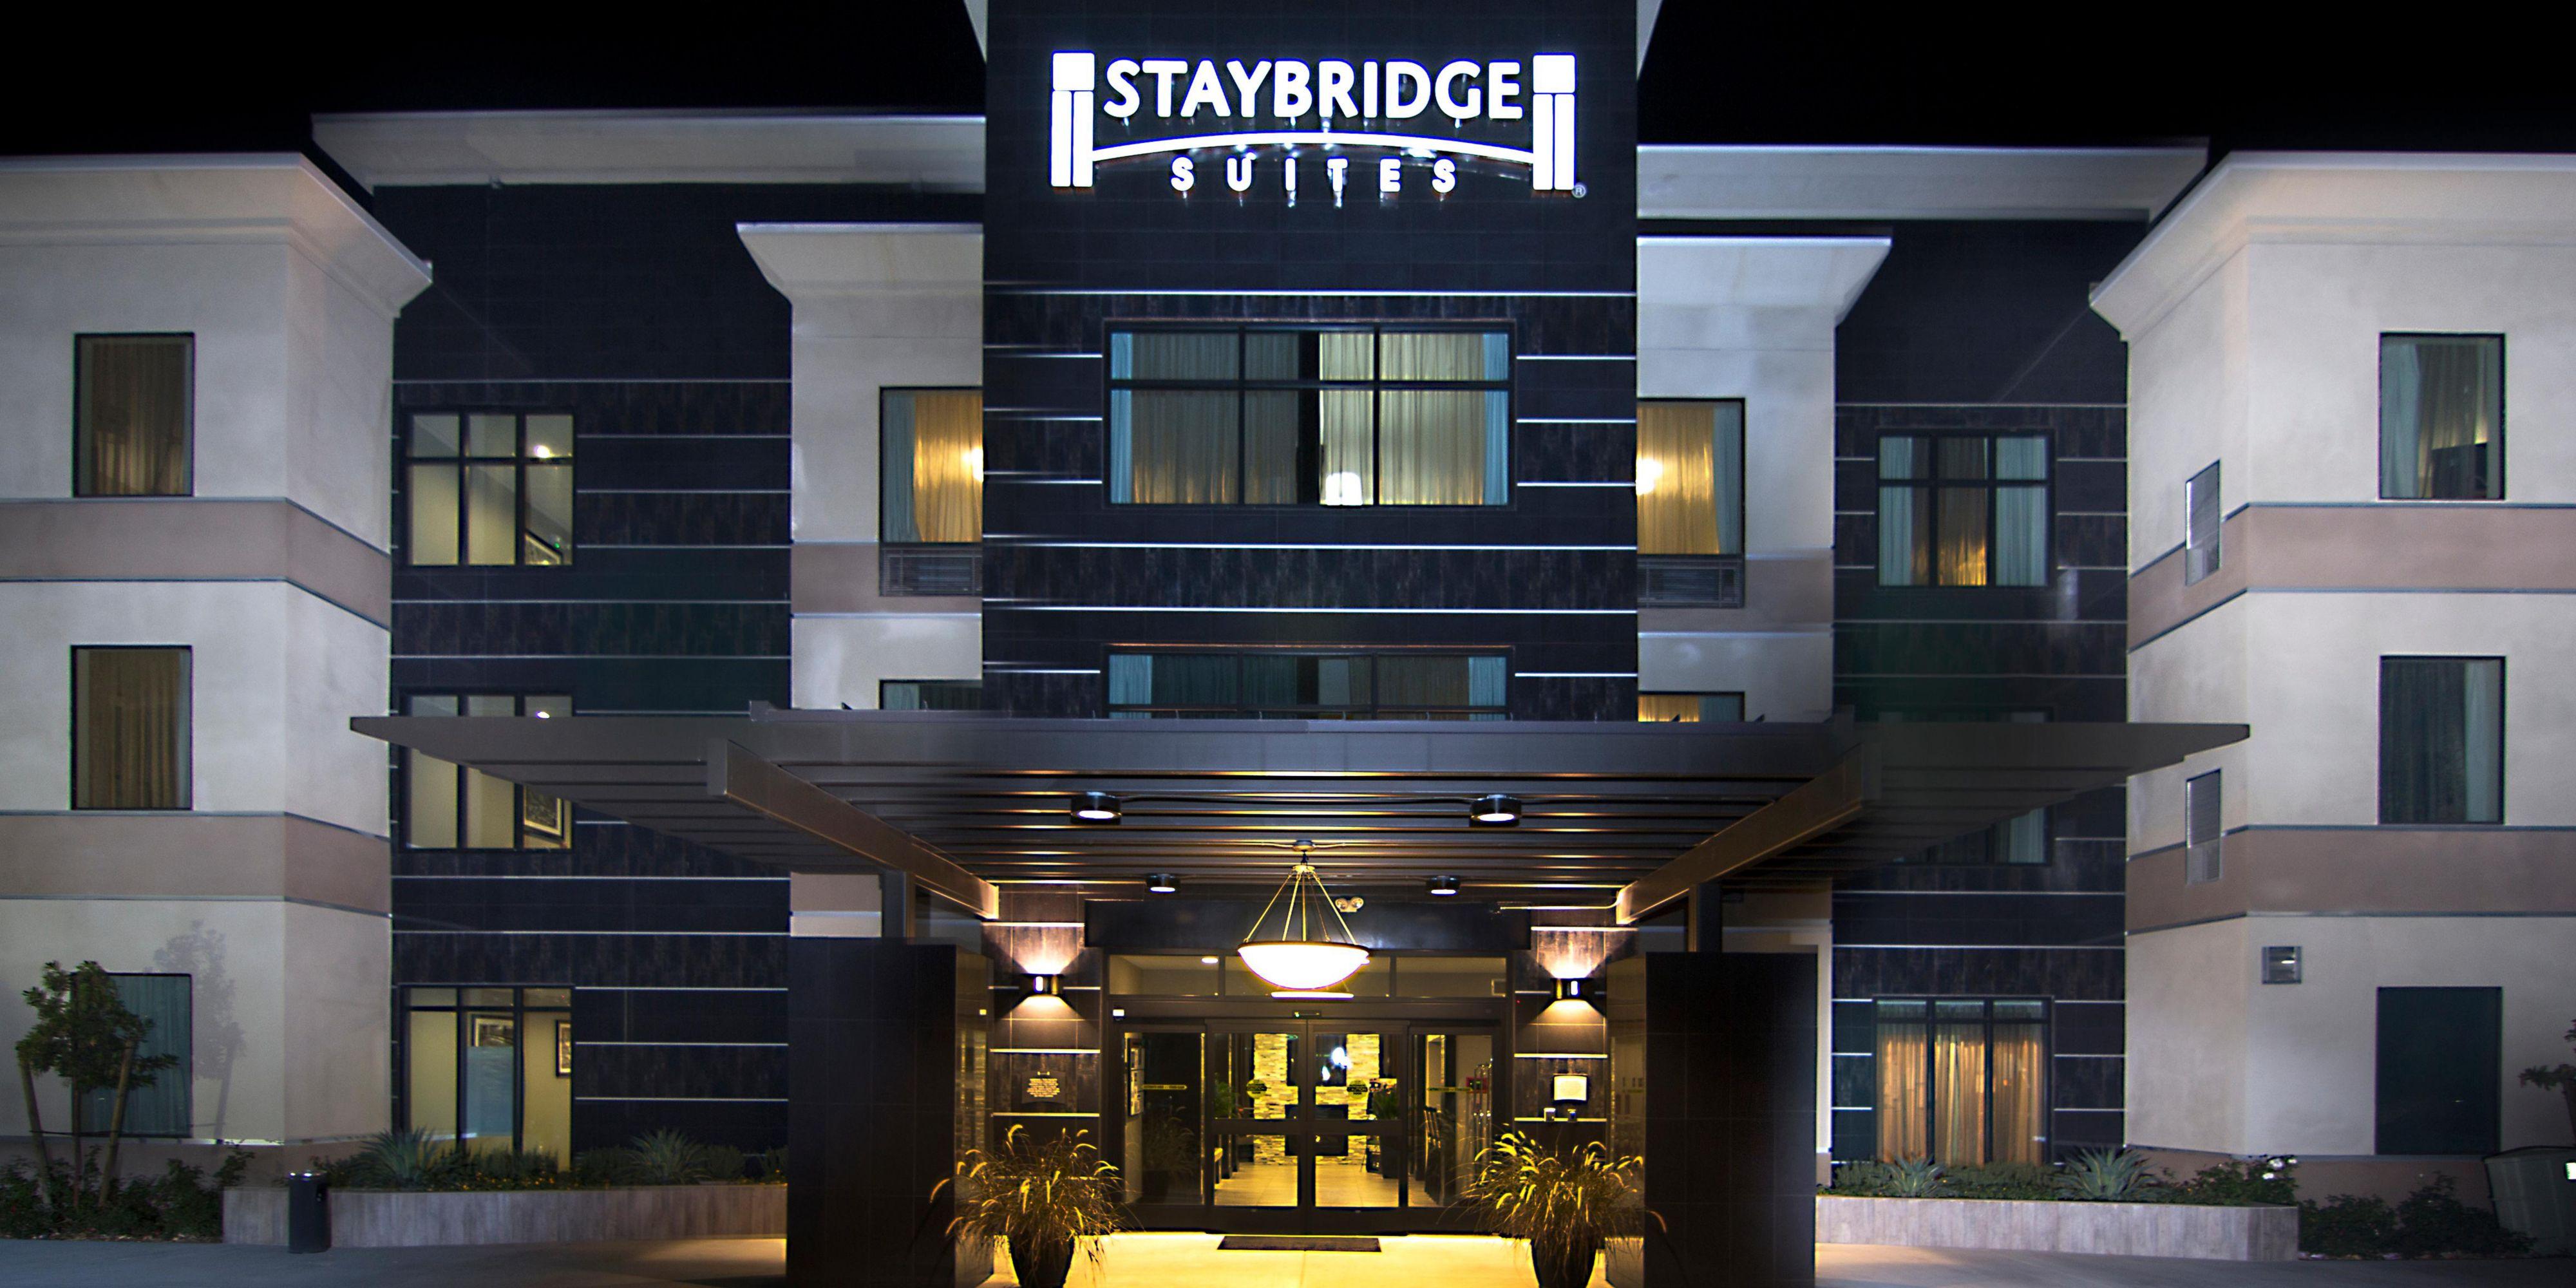 Staybridge Suites Carlsbad - San Diego image 0